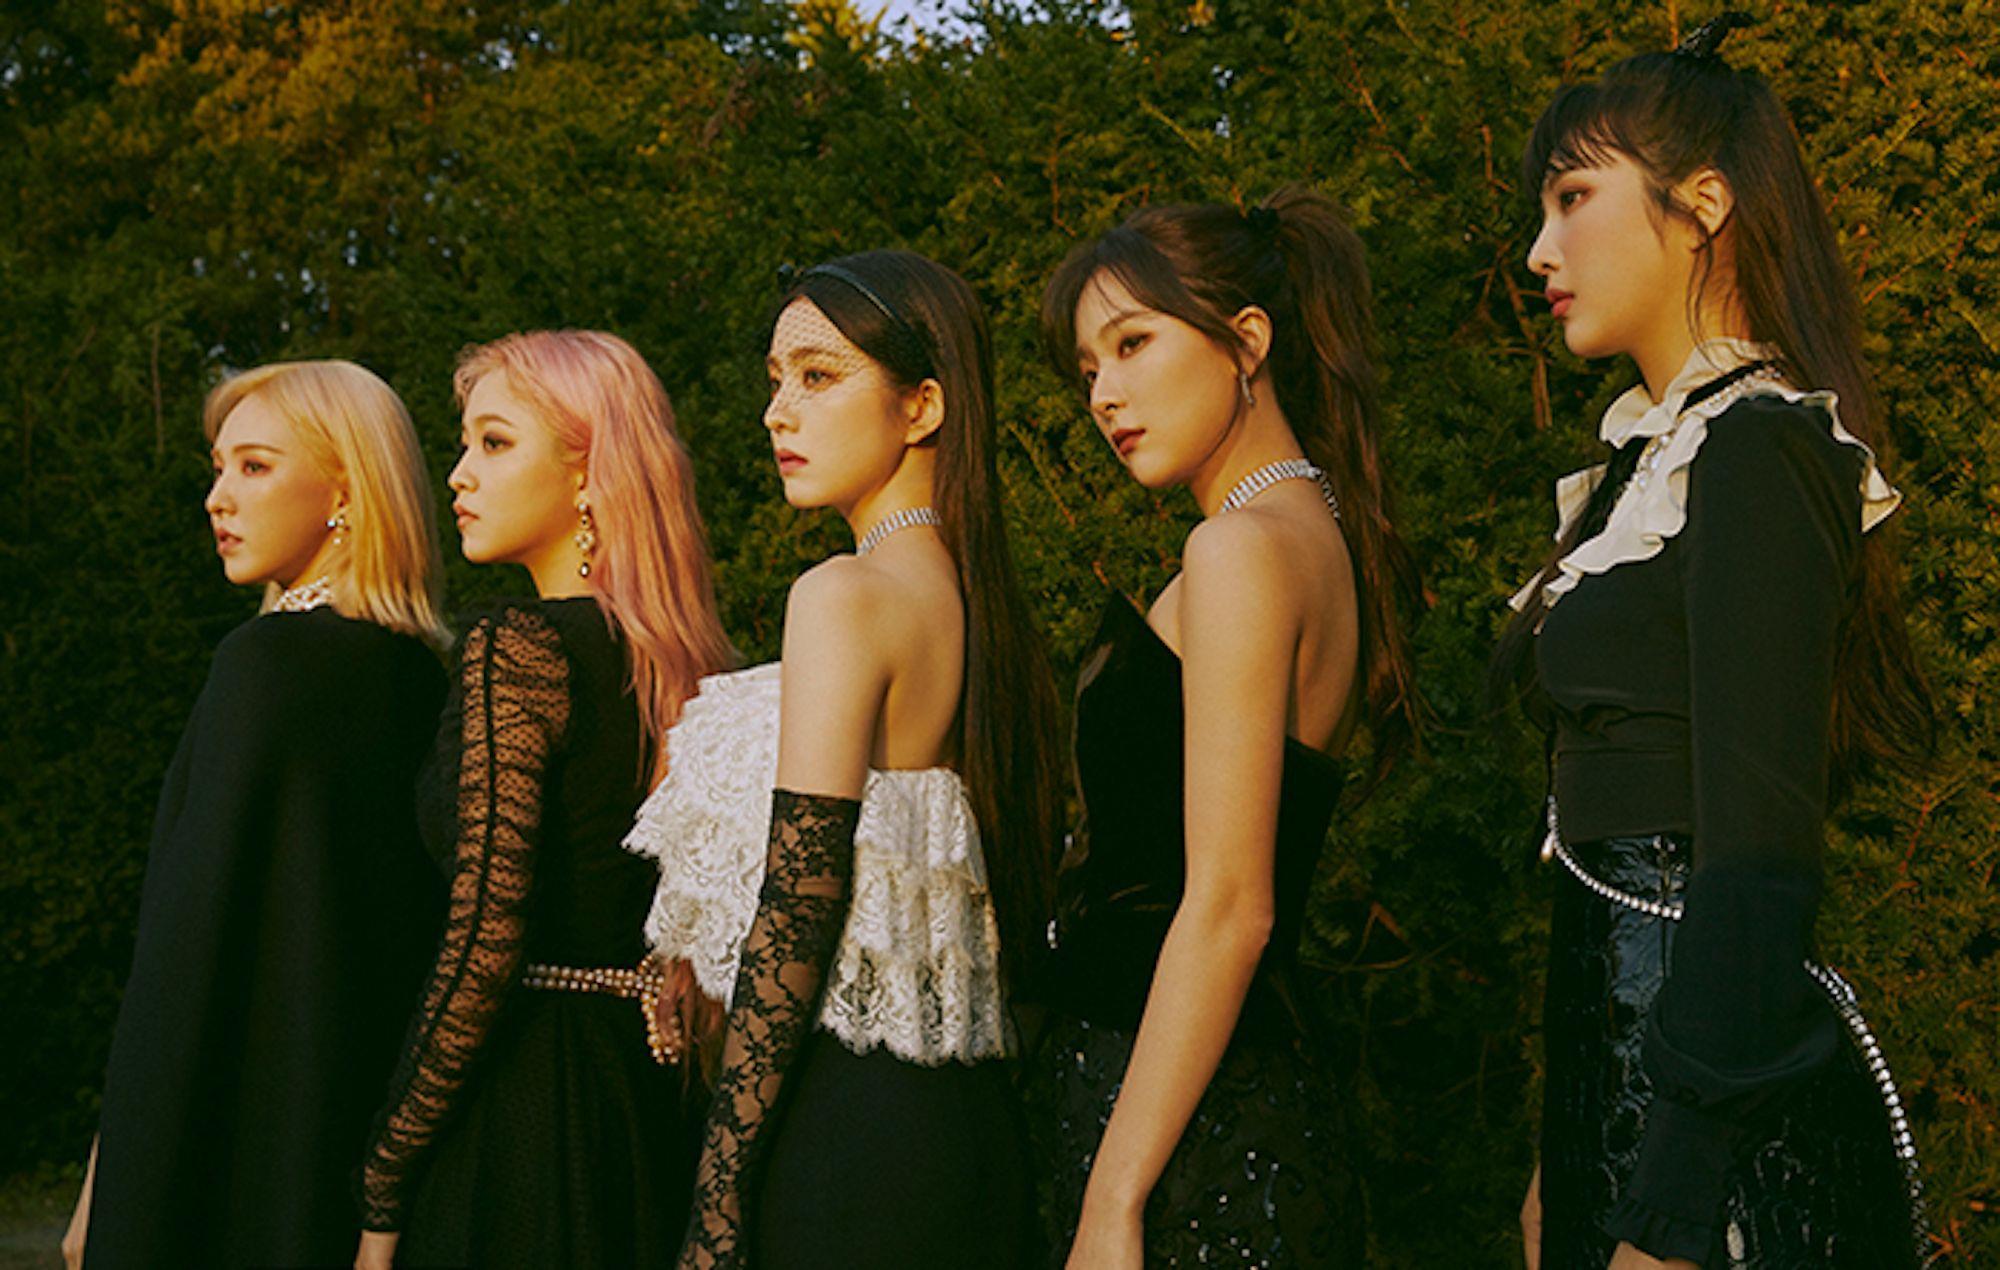 Red Velvet Psycho Wallpapers Top Free Red Velvet Psycho Backgrounds Wallpaperaccess